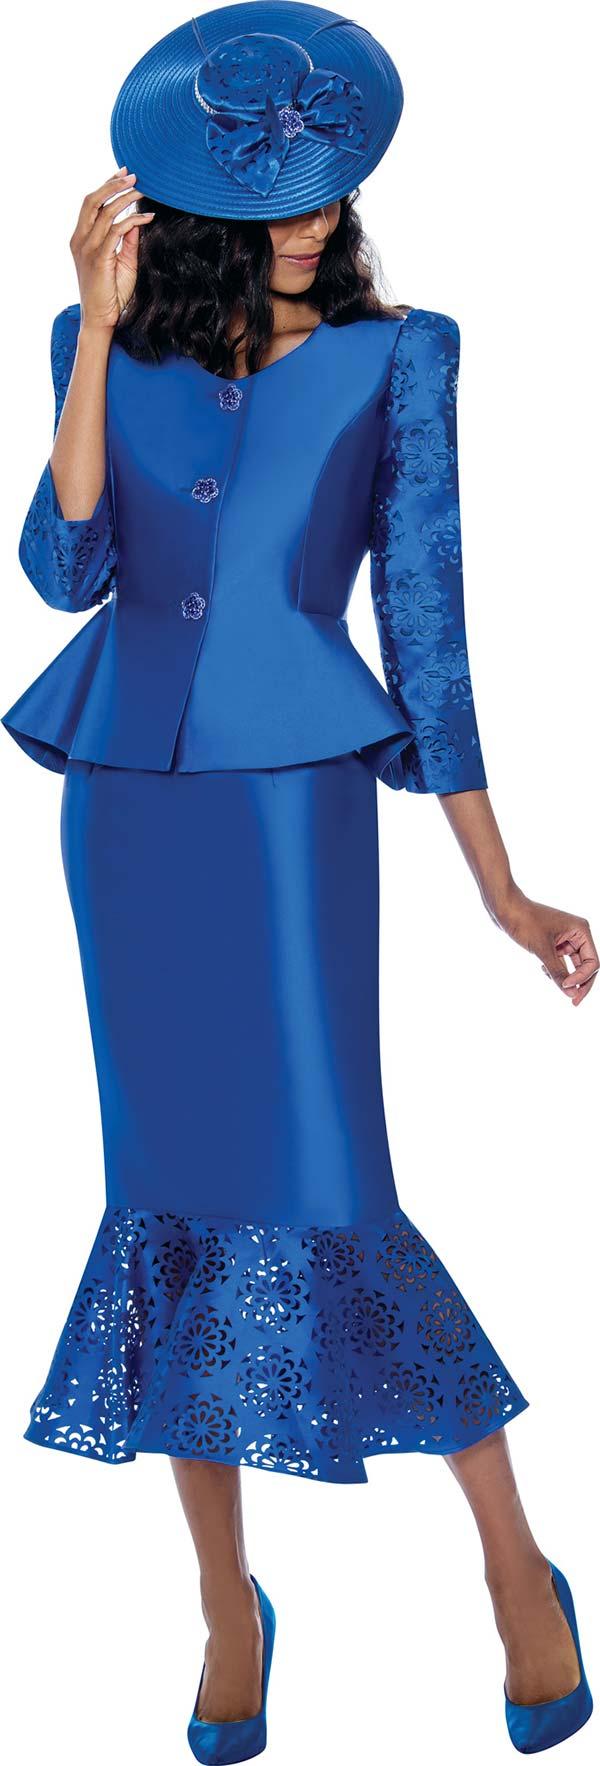 GMI 8162-Royal - Ladies Peplum Jacket And Flounce Hem Skirt Suit With Cut-Out Pattern Design